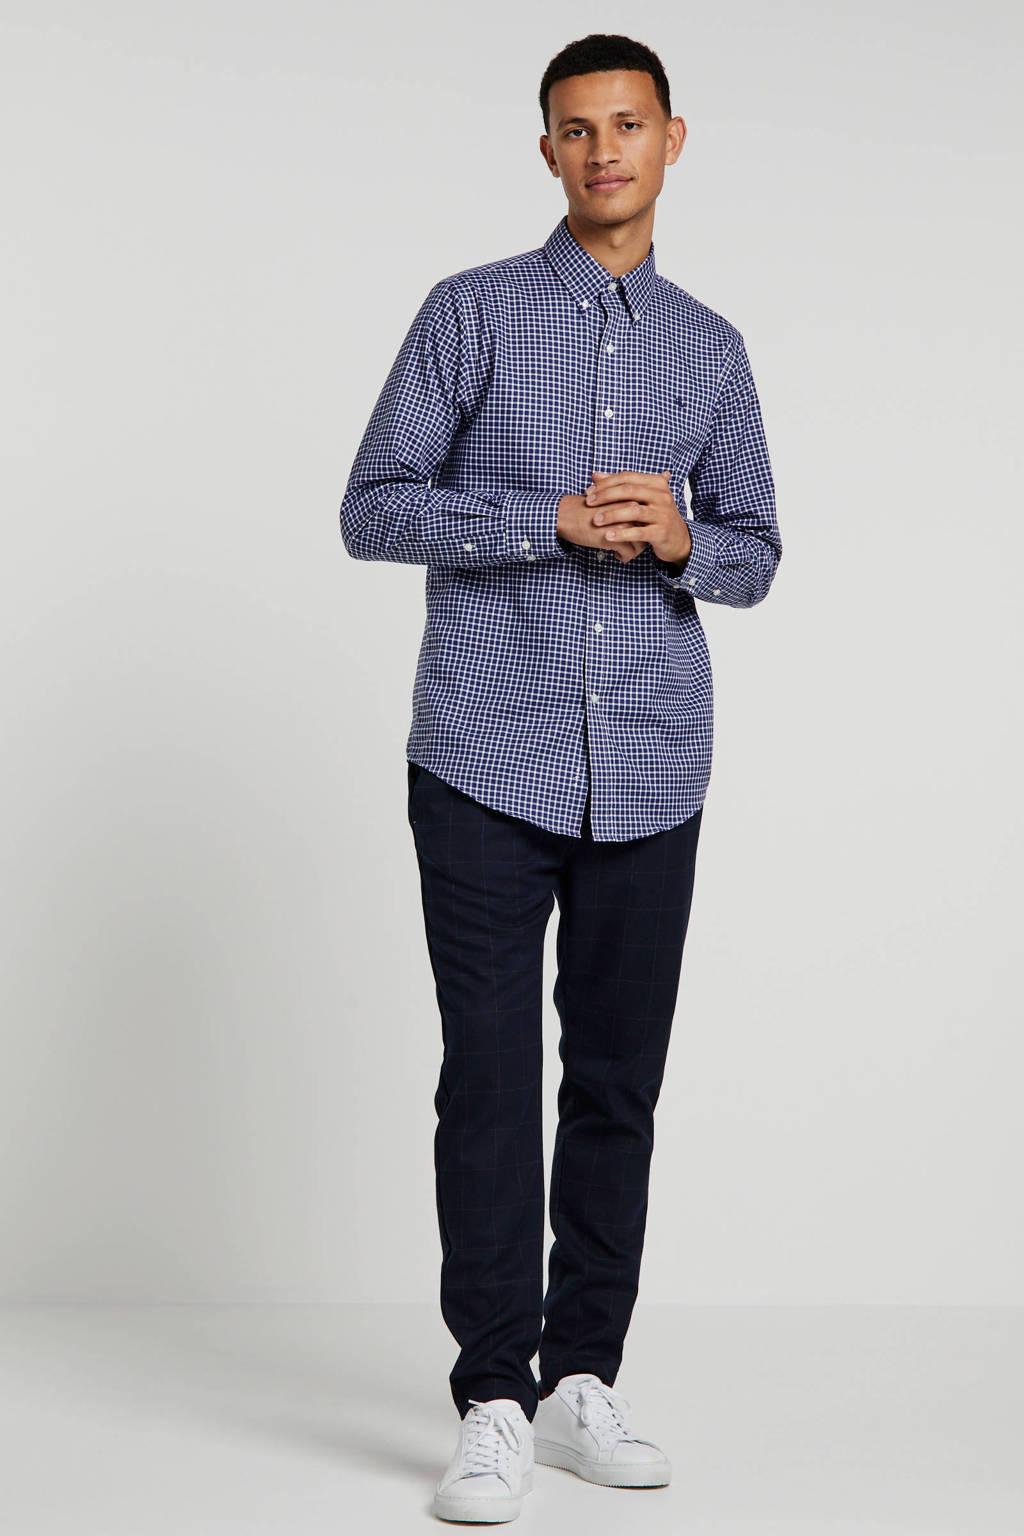 POLO Ralph Lauren geruit regular fit overhemd blauw/wit, Blauw/wit